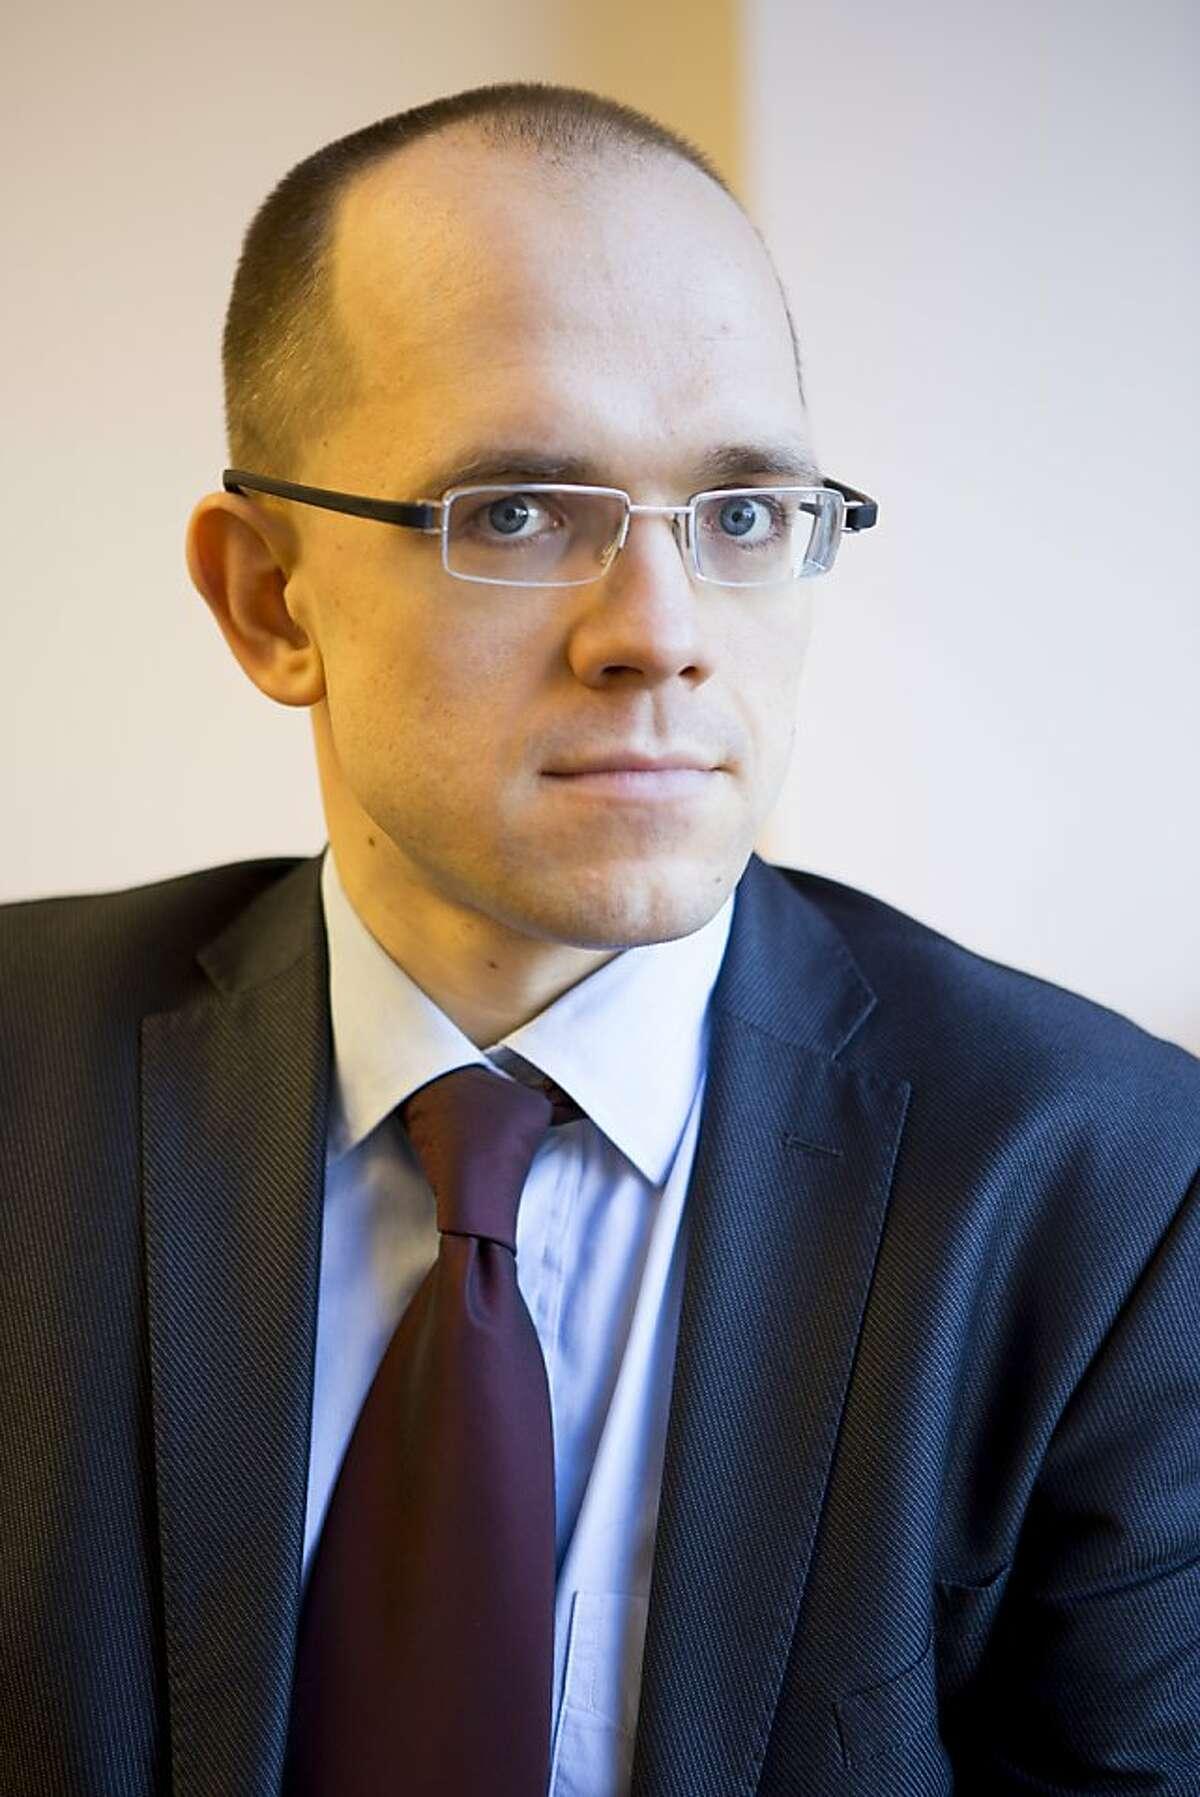 Evgeny Morosov at the Open Society Foundations in New York City, March 4, 2013.